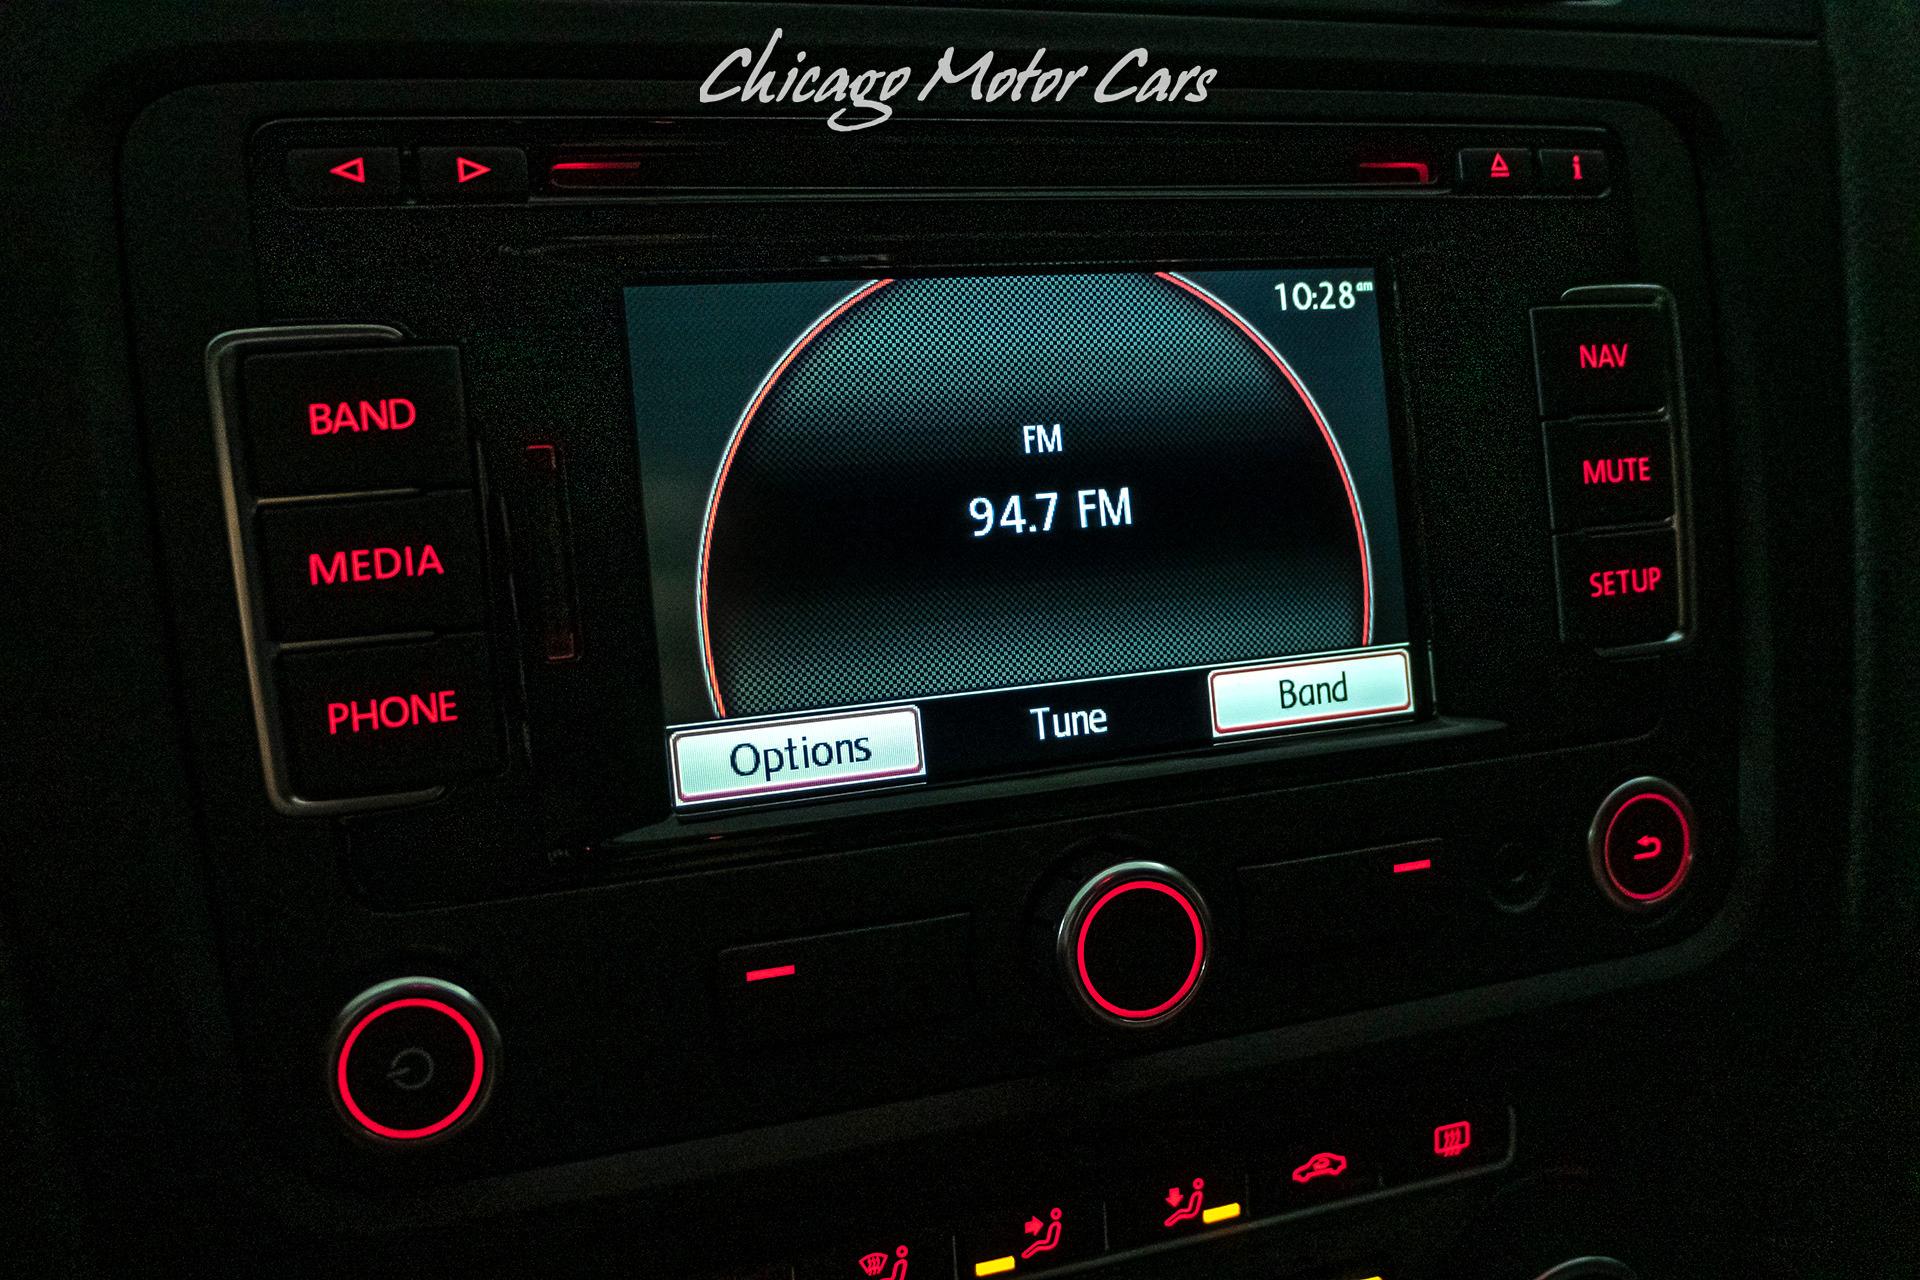 Used-2012-Volkswagen-Golf-R-2-Door-wSunroof---NAV-APR-STAGE-2-PLUS-TUNE